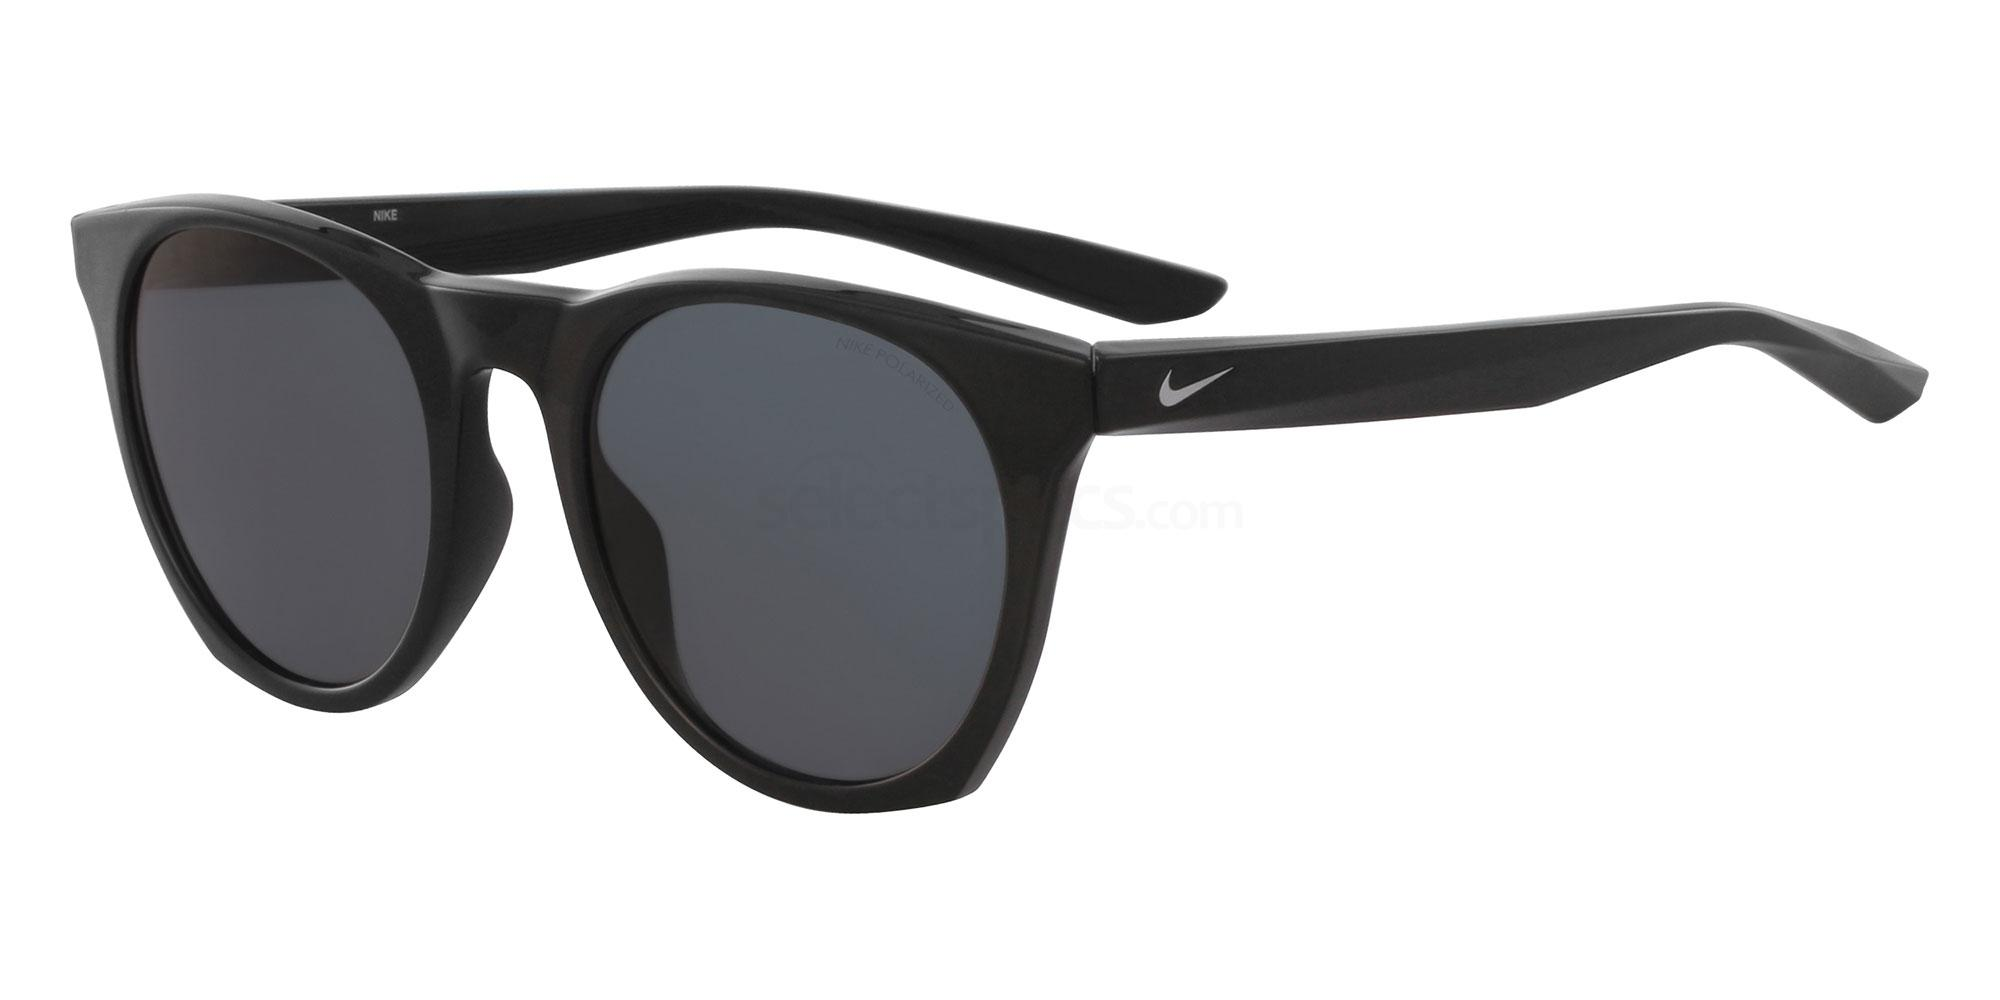 001 ESSENTIAL HORIZON P EV1120 Sunglasses, Nike